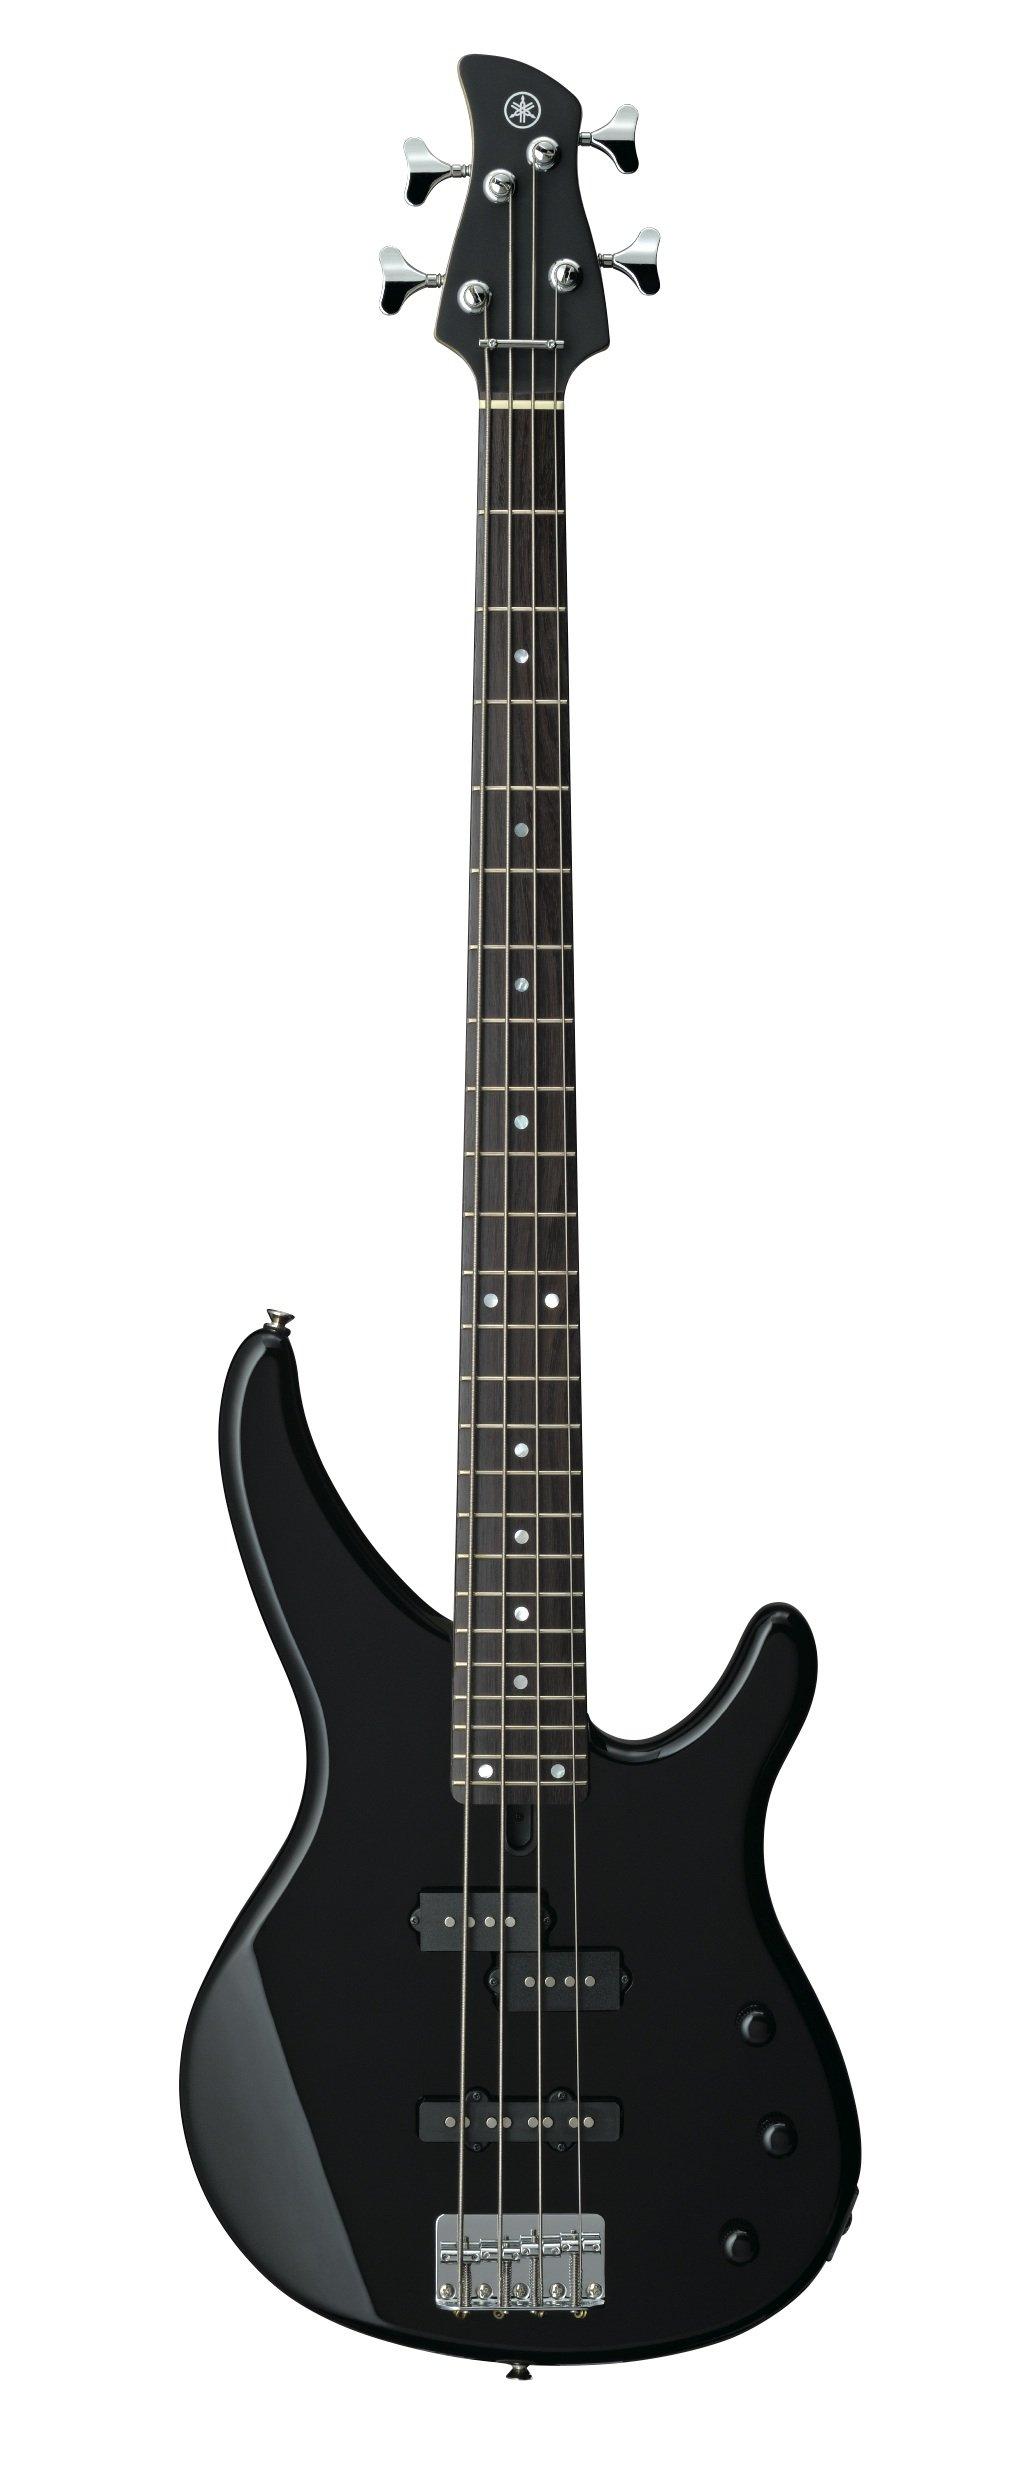 Yamaha 4-String Bass Guitar, Right Handed, Black, 4-String (TRBX174 BL) by YAMAHA